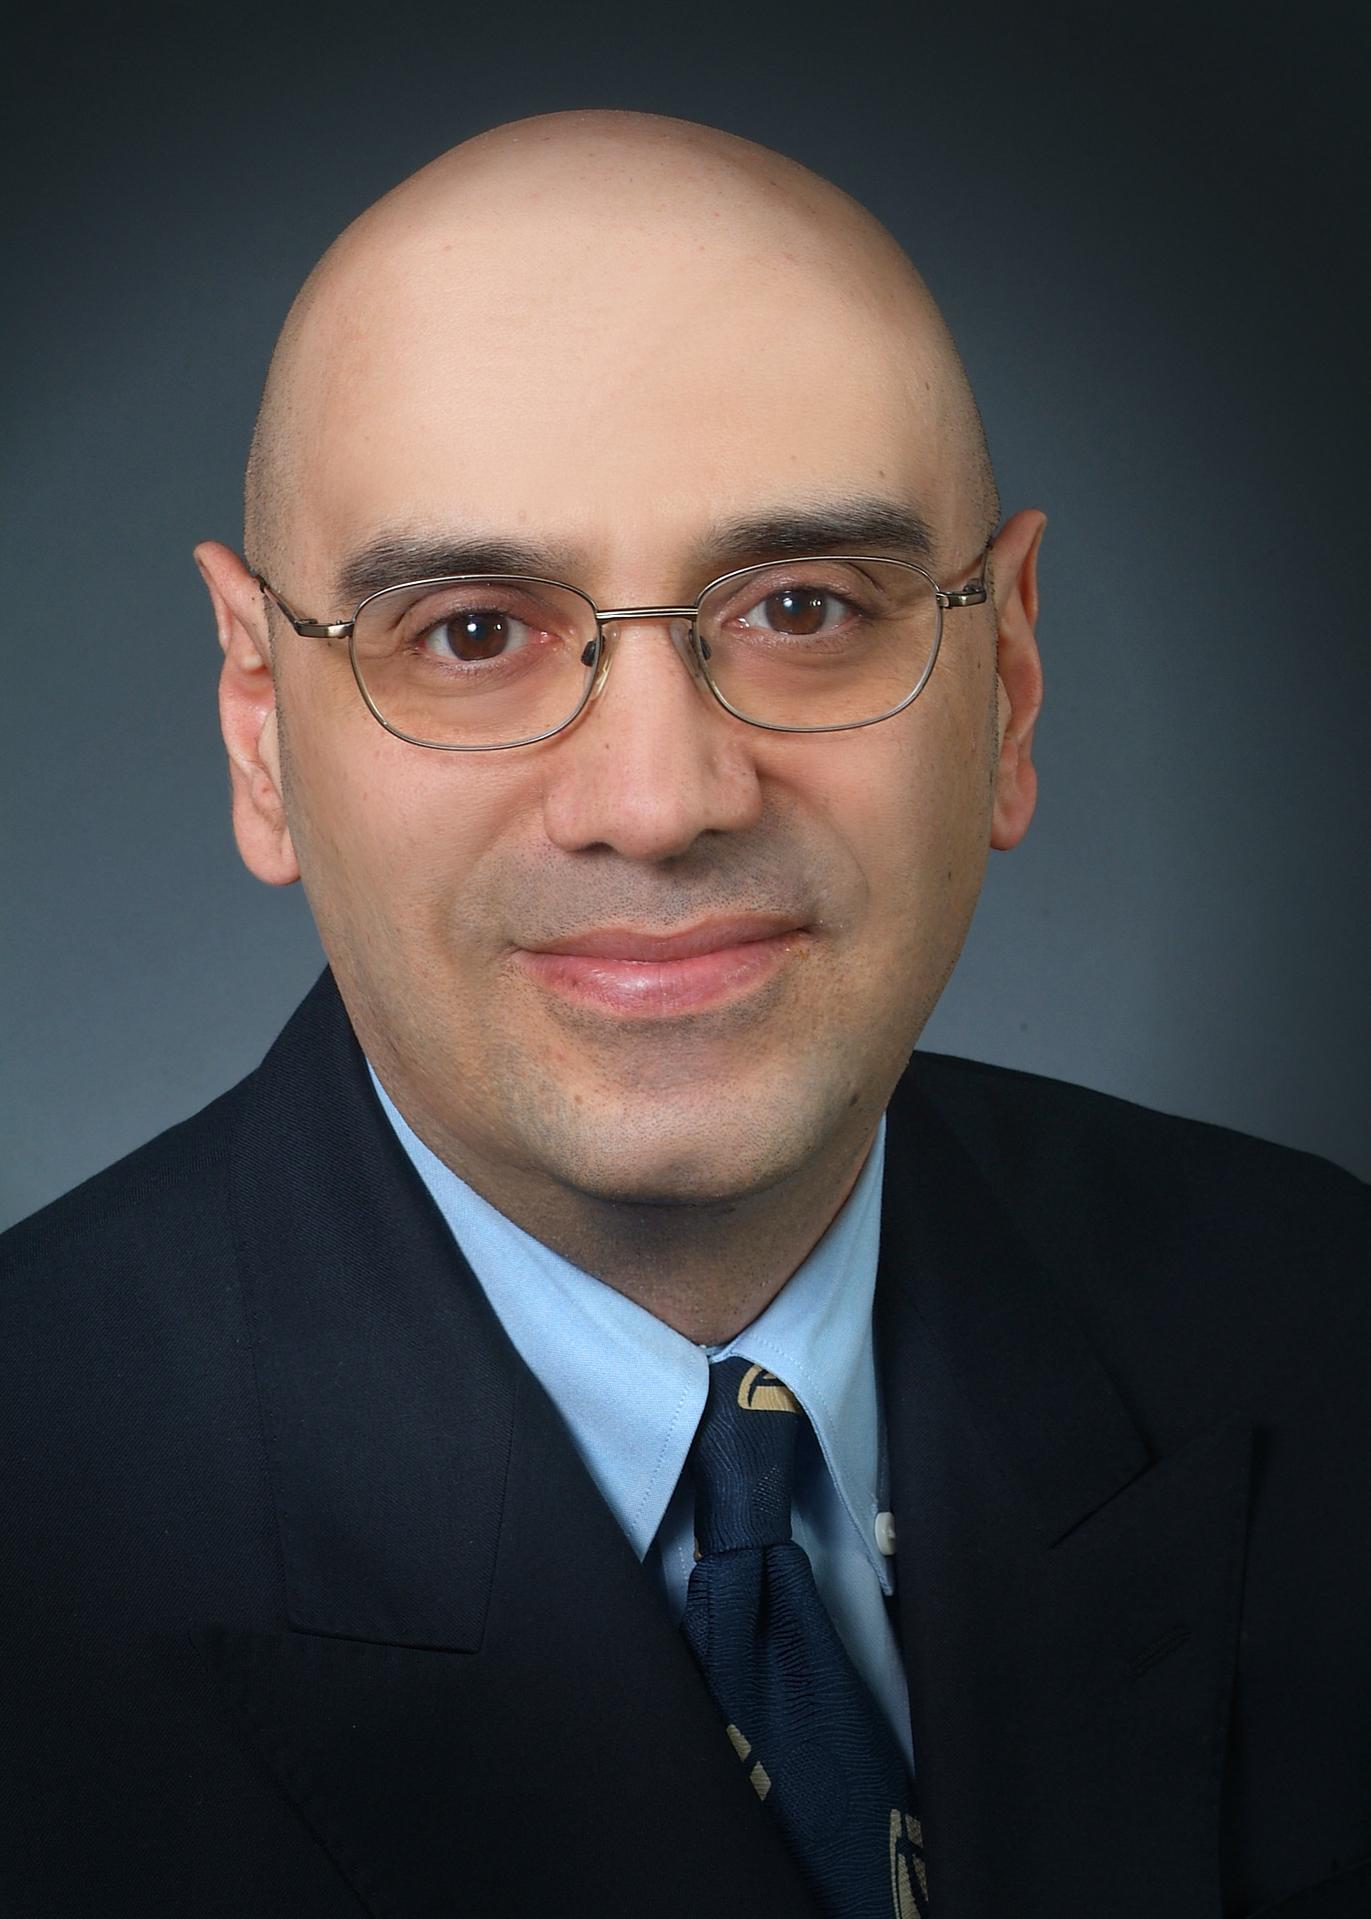 Matthew Moadebi